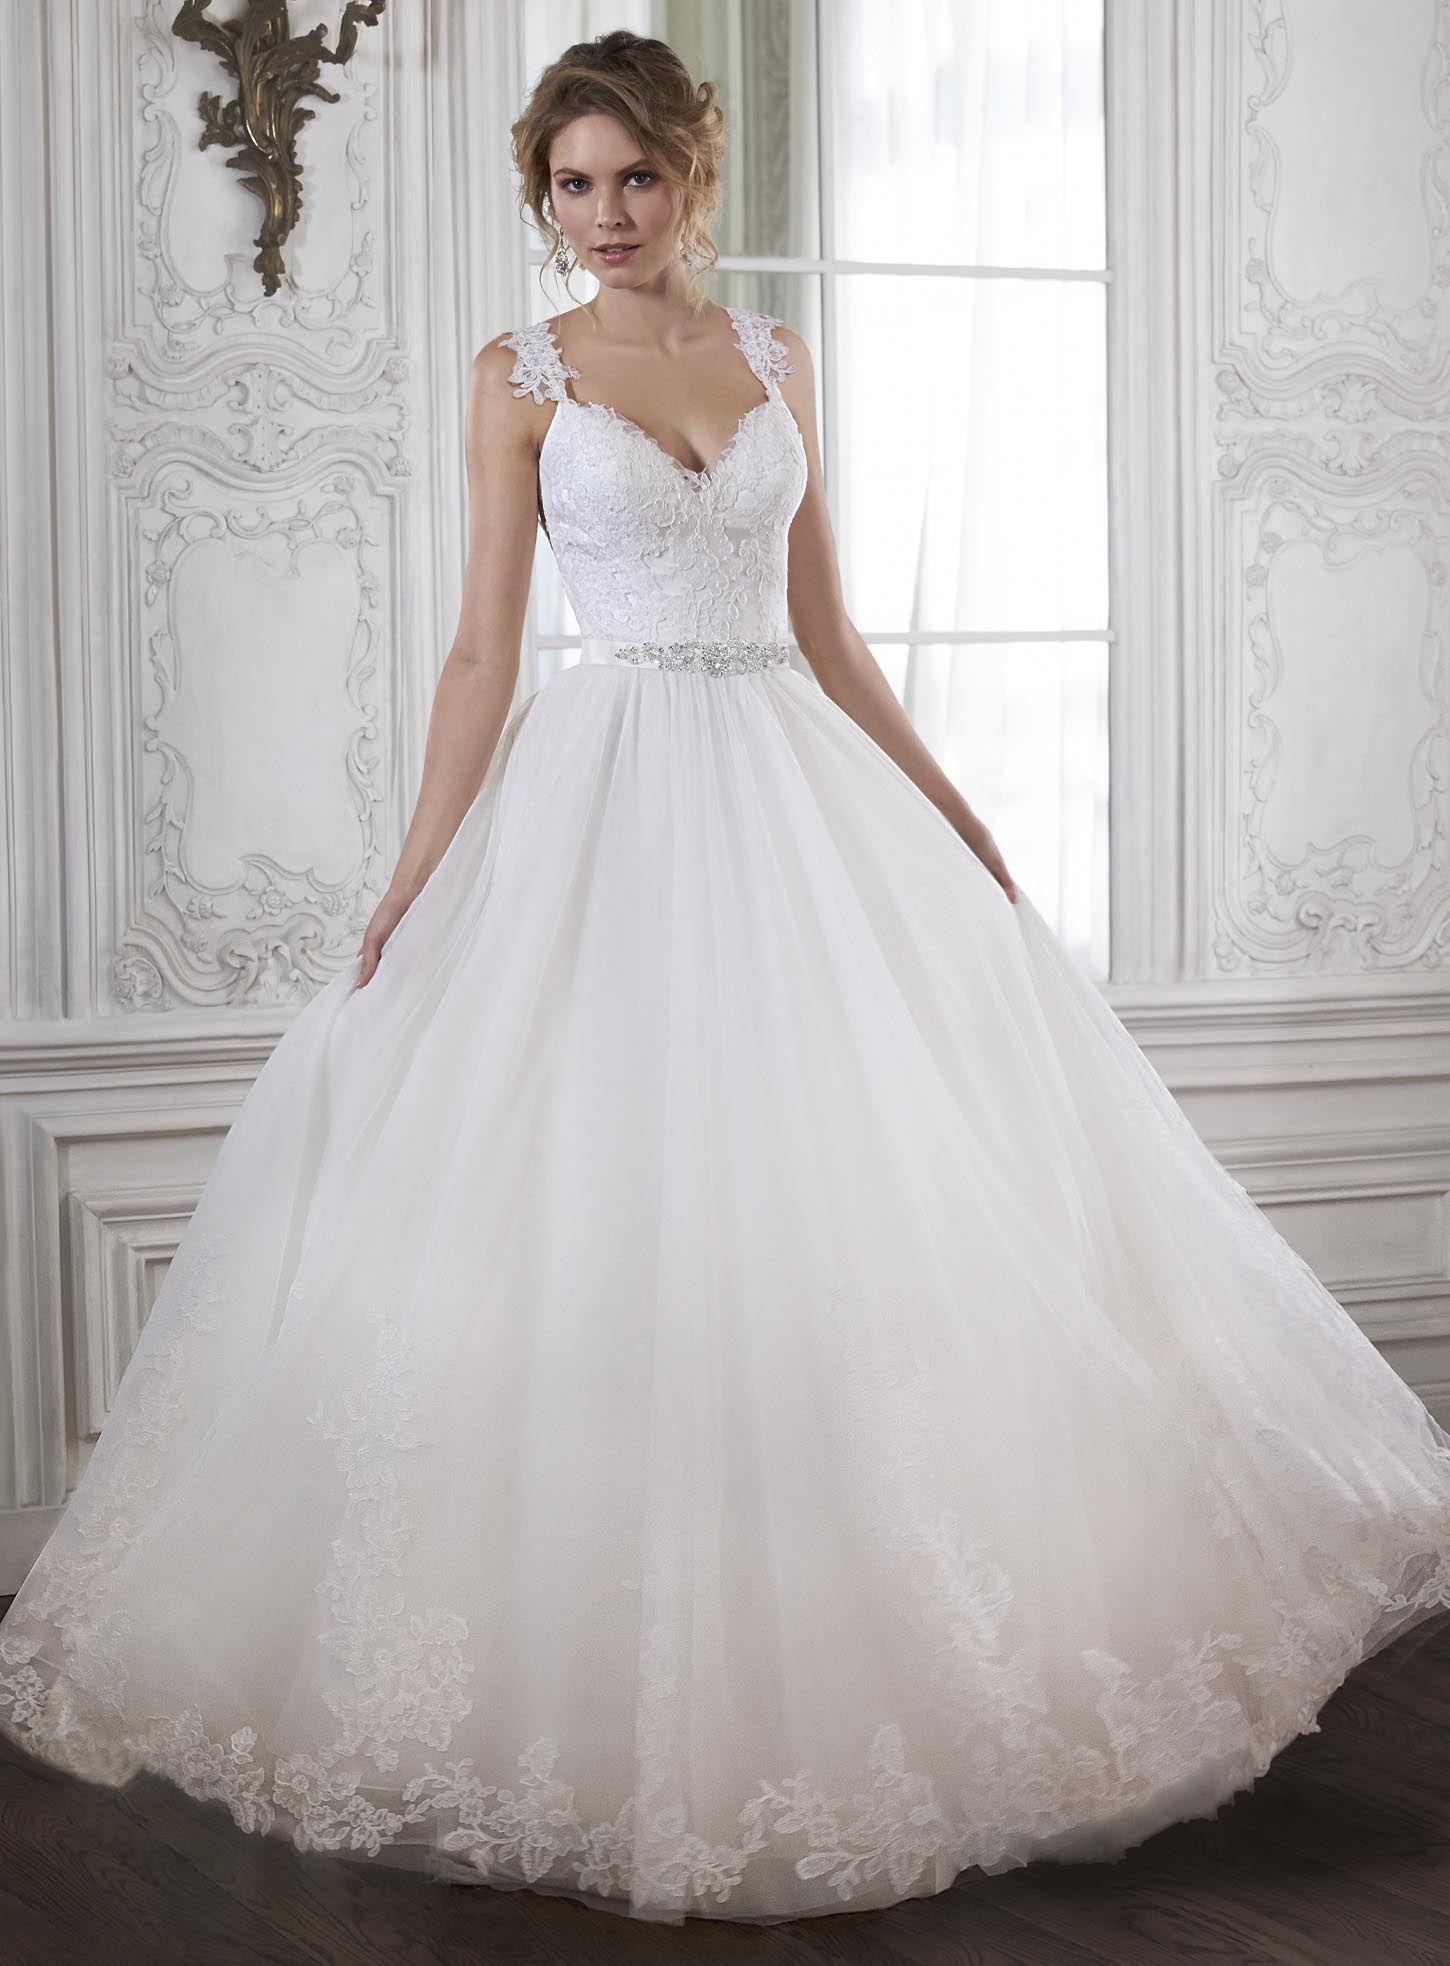 Wedding dresses with beading  ElegantCharming ALine VNeck Natural Waist Tulle Wedding Dress